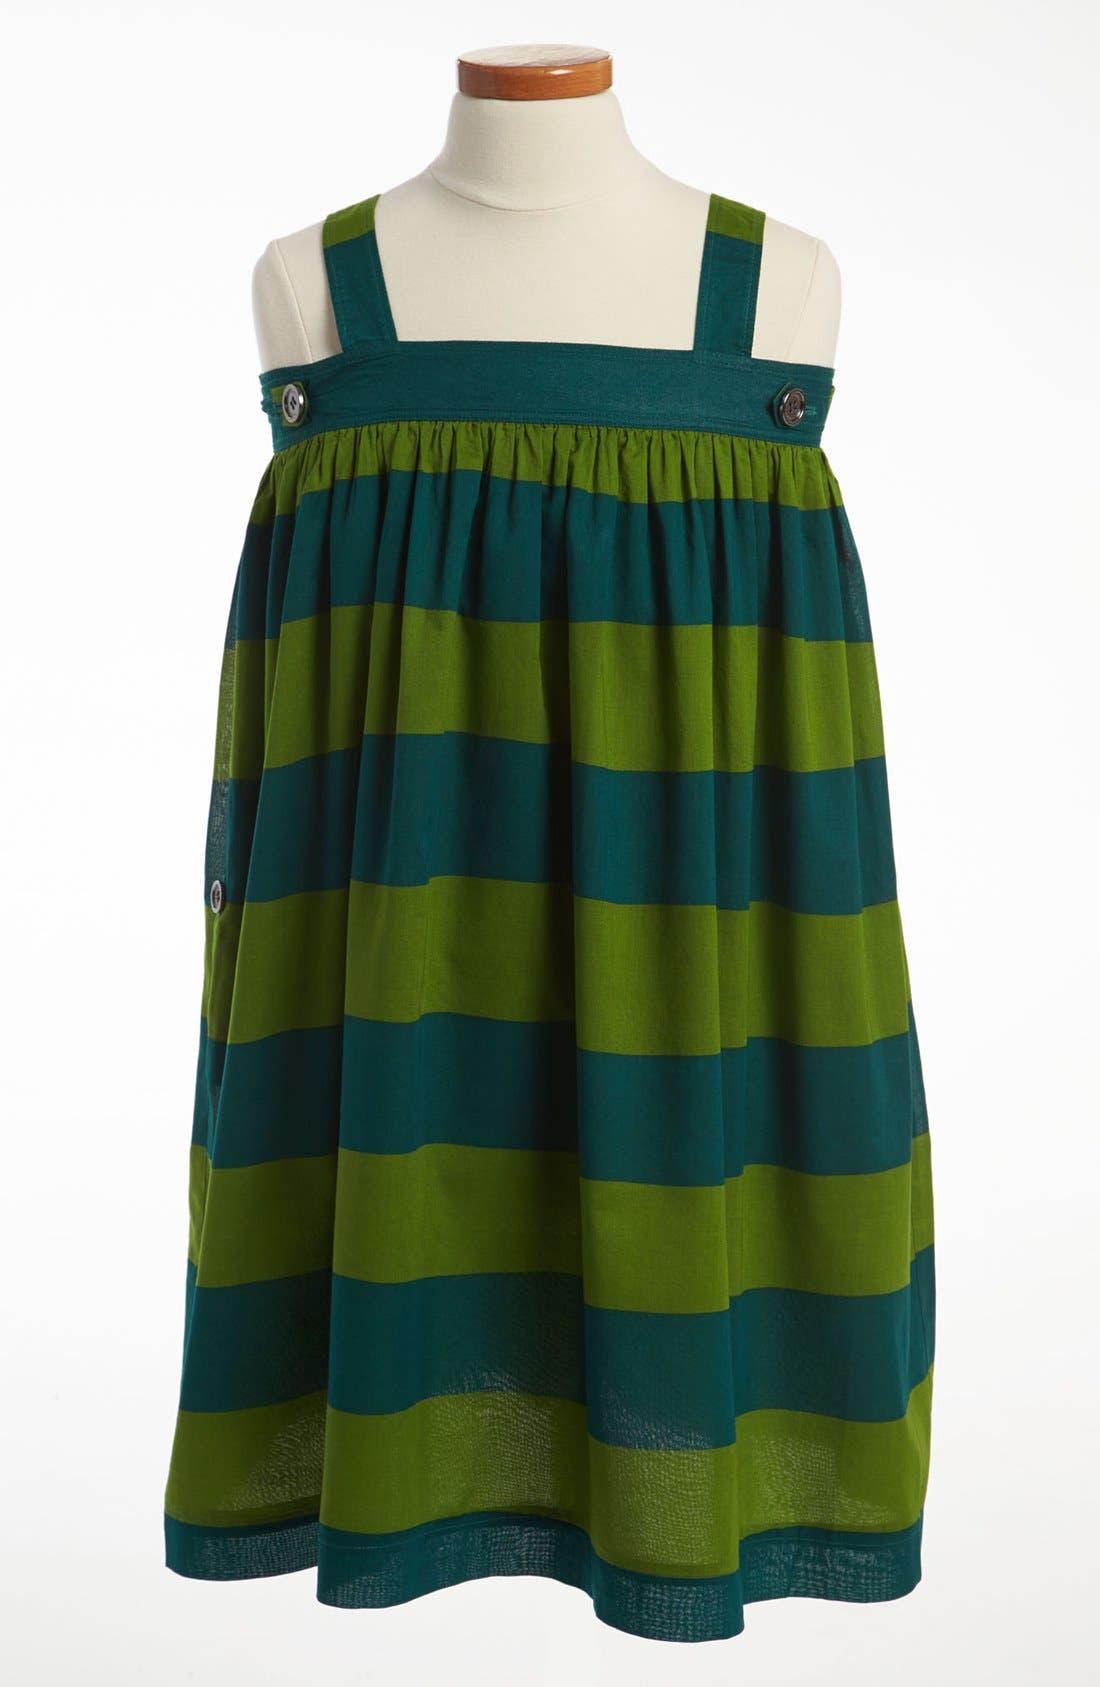 Main Image - Burberry 'Dusty' Dress (Little Girls & Big Girls)